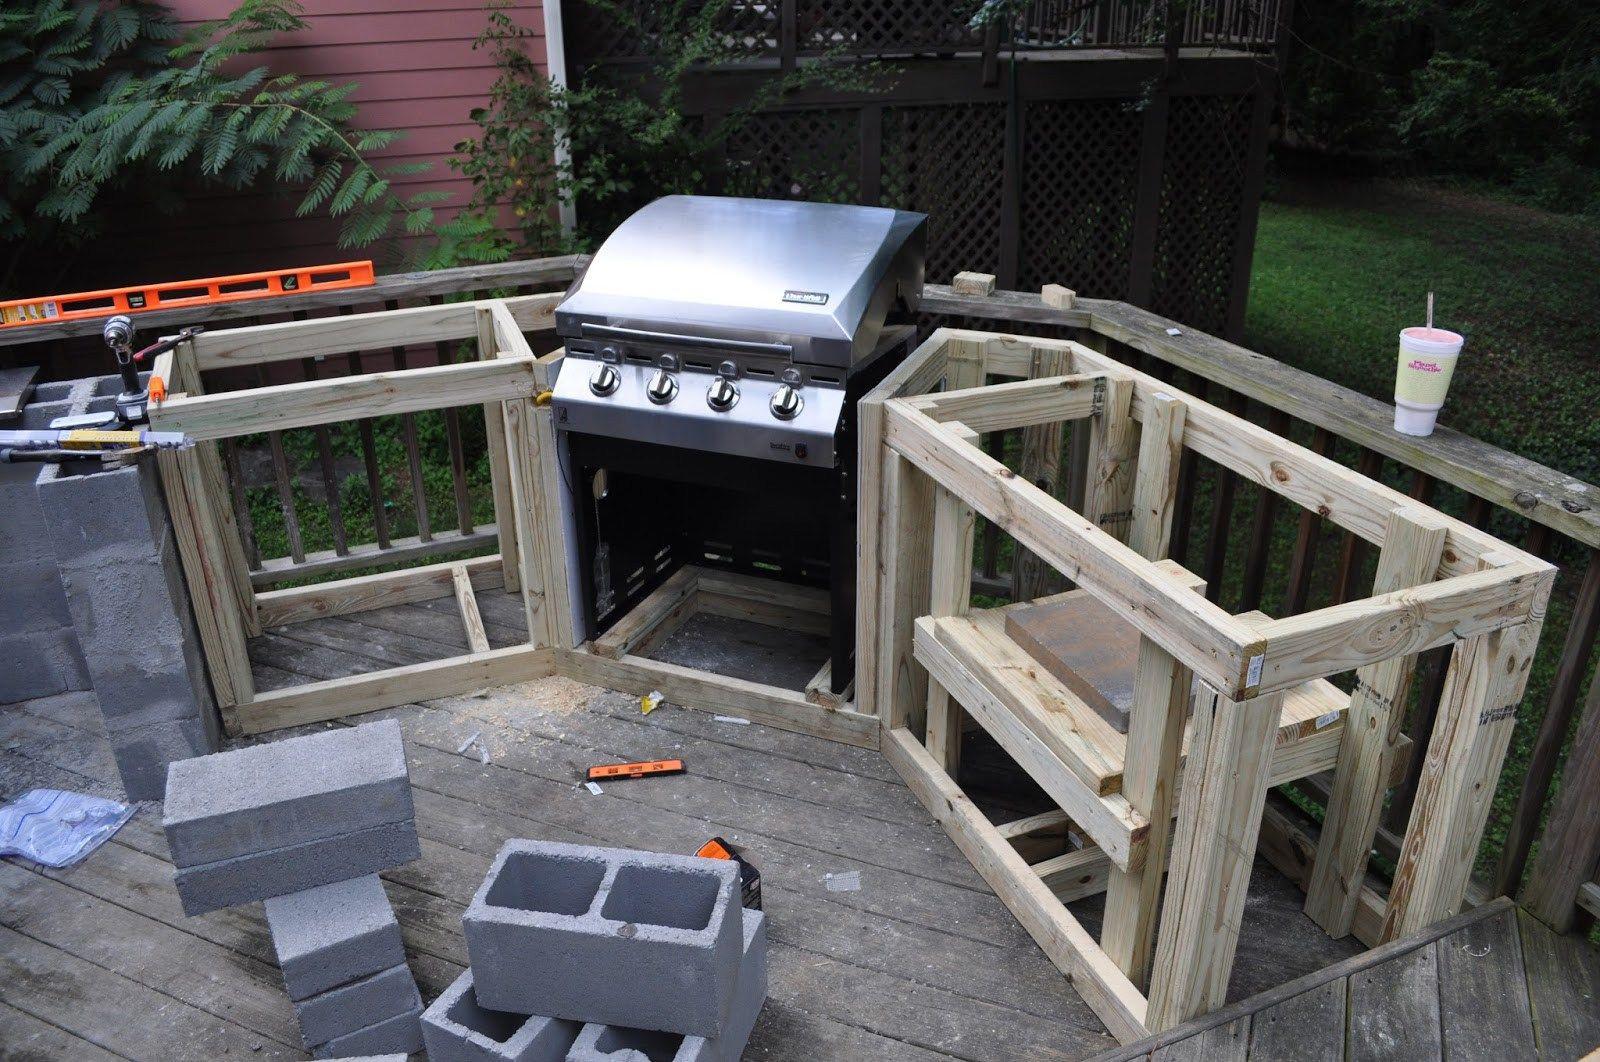 Best ideas about DIY Outdoor Kitchen Kits . Save or Pin Outdoor Kitchen Frame Kits DIY — 3 Design Kitchen World Now.